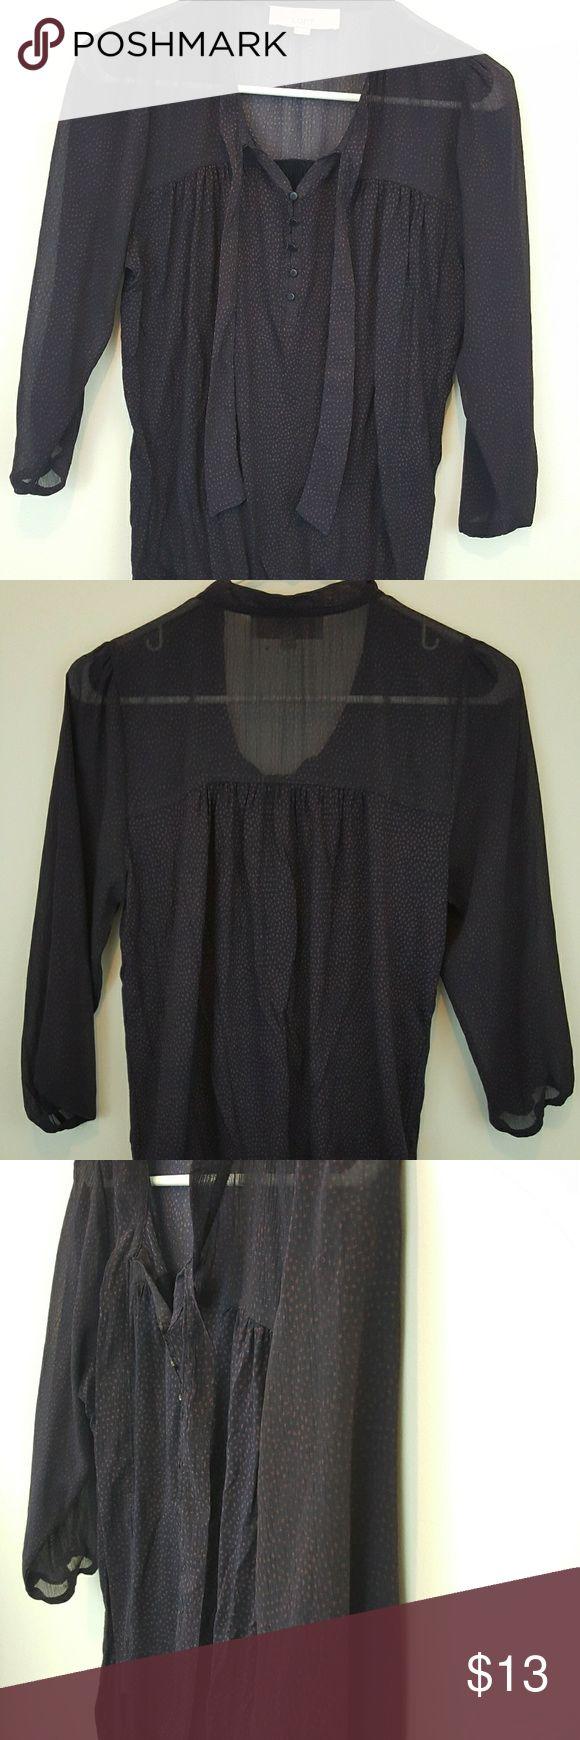 Ann Tylor Loft Women's Polka Dot Blouse Button Down ,Polka Dot, Long Sleeves Blouse with Stretchable waist Band LOFT Tops Blouses